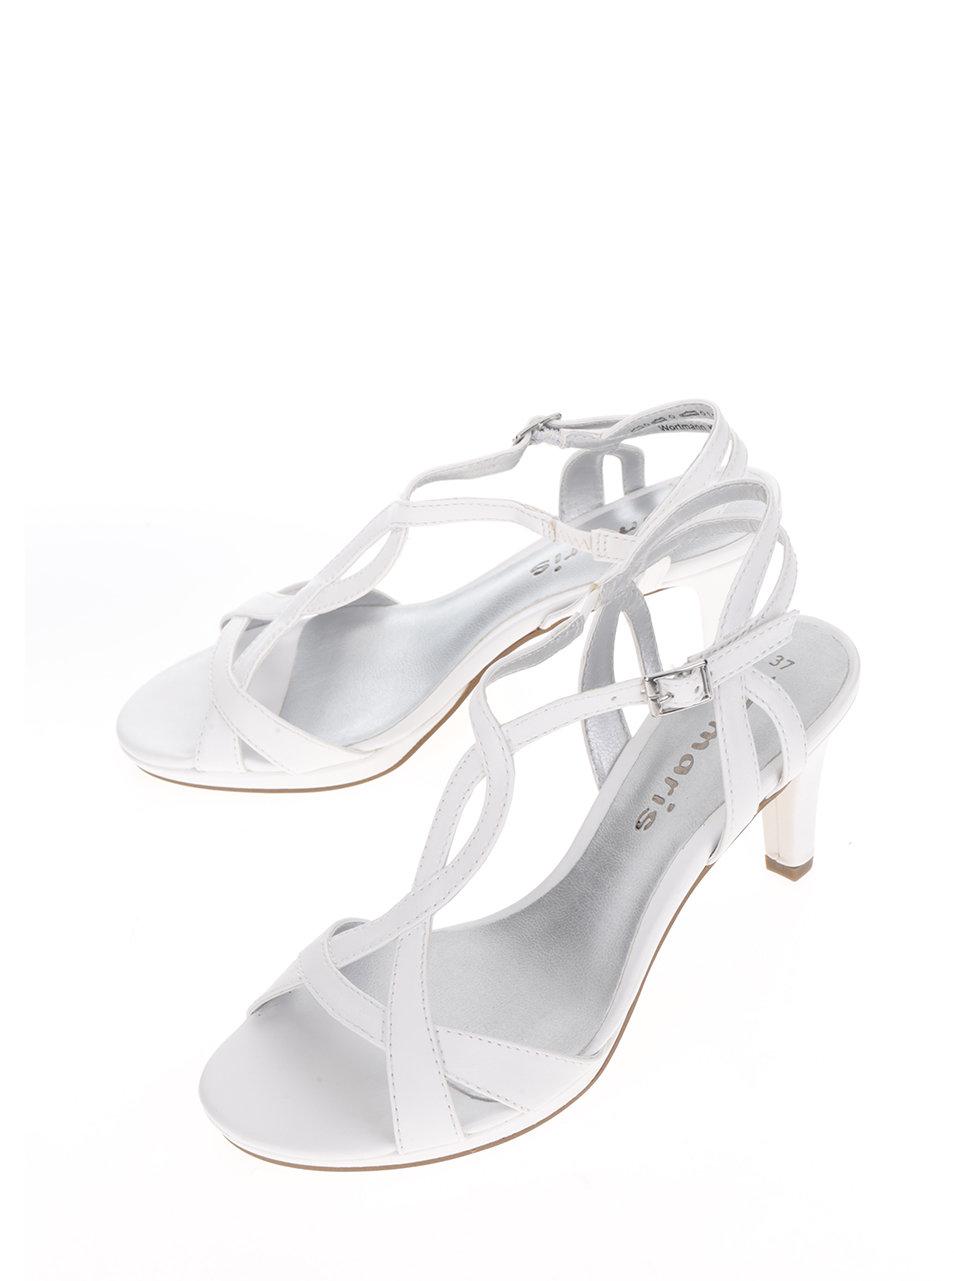 01574eccc5e4 Biele remienkové sandále na podpätku Tamaris ...